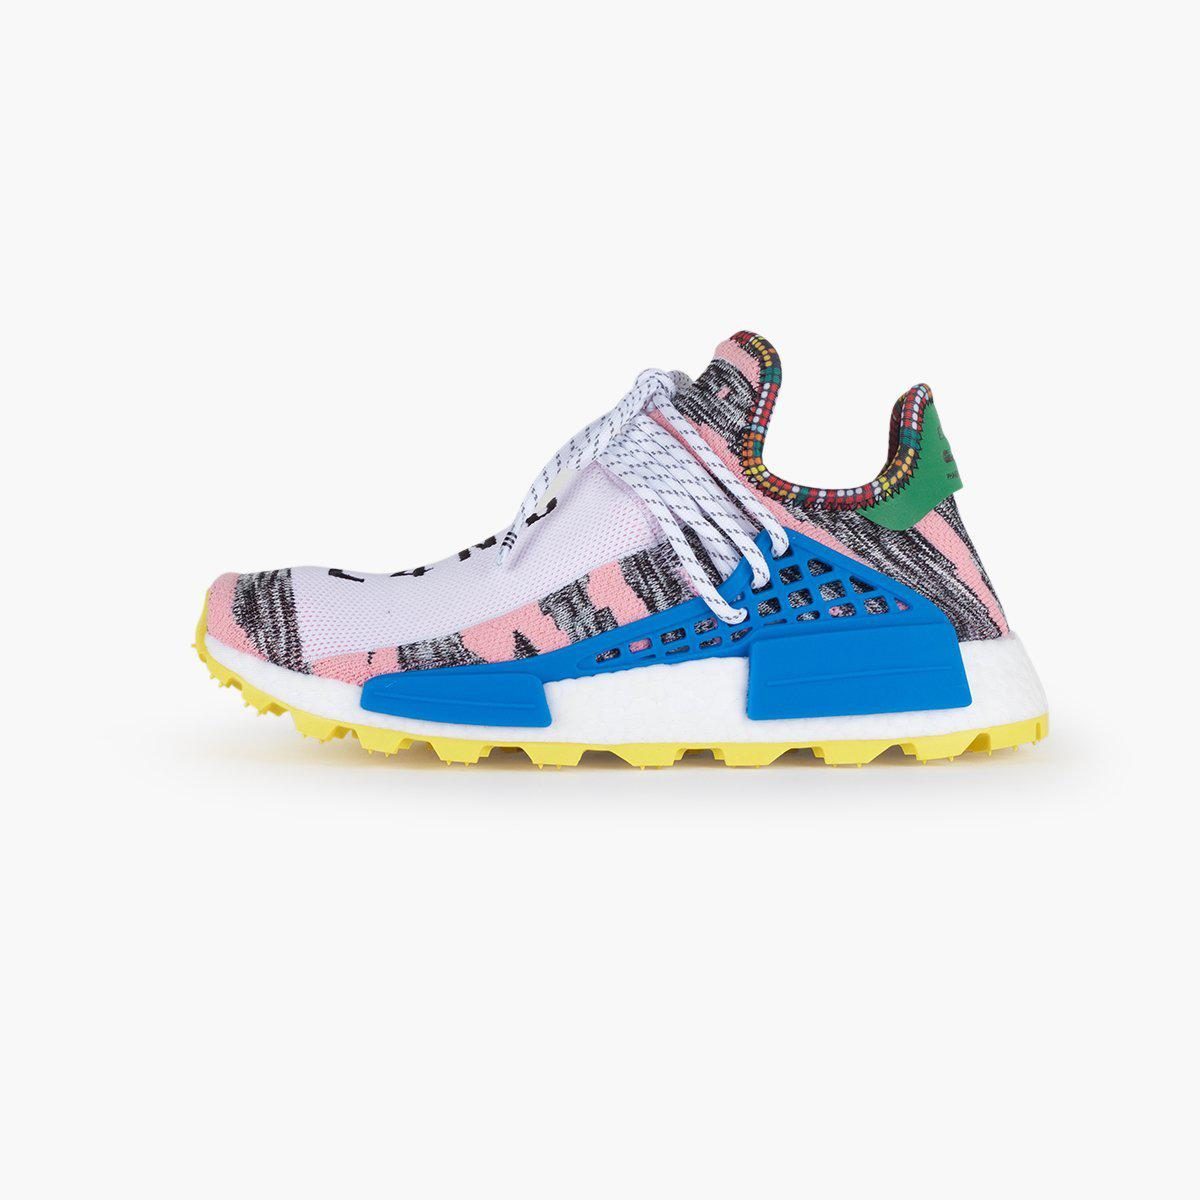 4ba6944b7fd61 Adidas Originals Adidas Originals By Pharrell Wlliams Afro Hu Nmd in ...